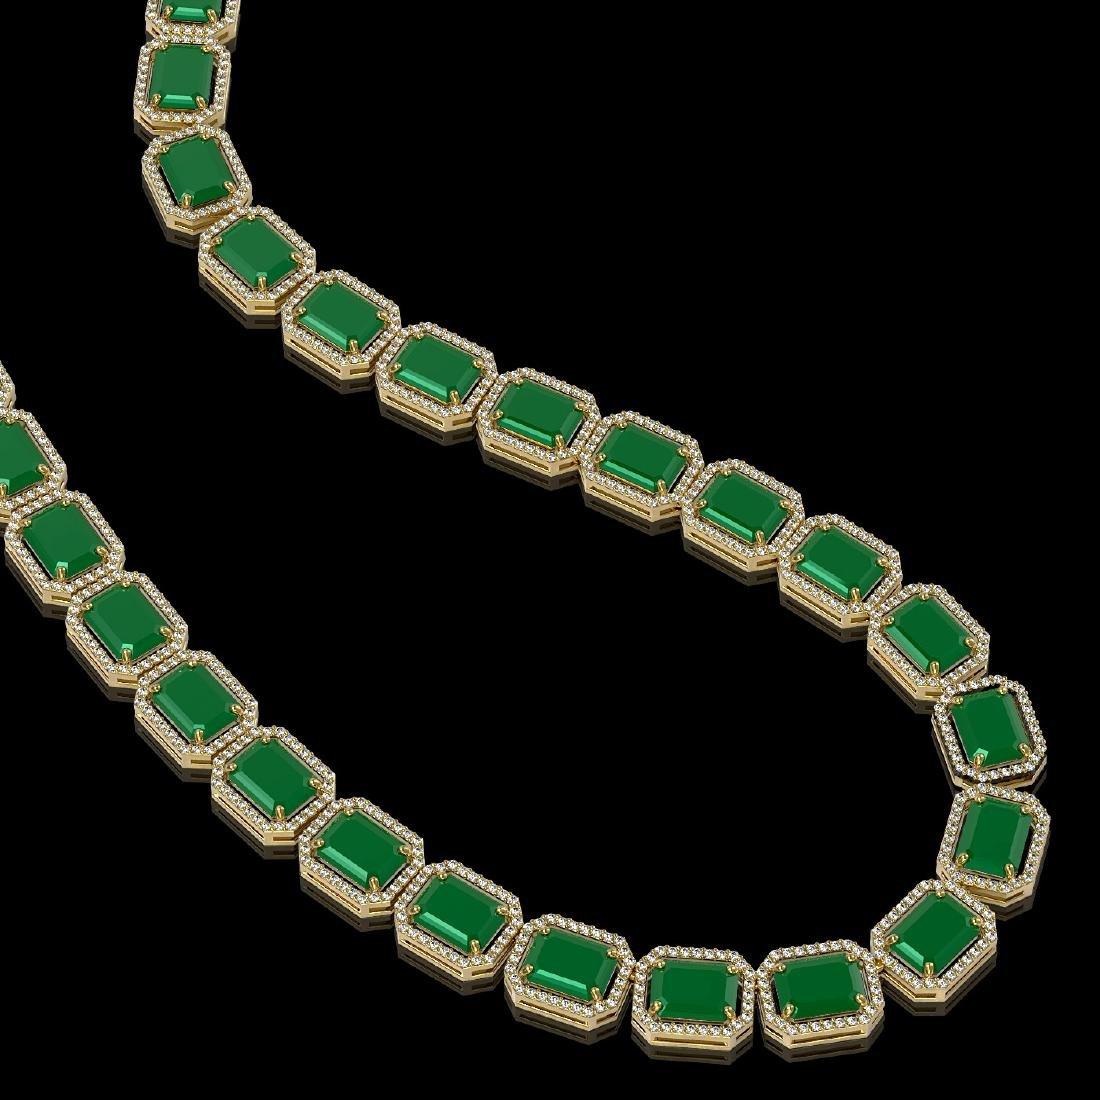 84.94 CTW Emerald & Diamond Halo Necklace 10K Yellow - 2